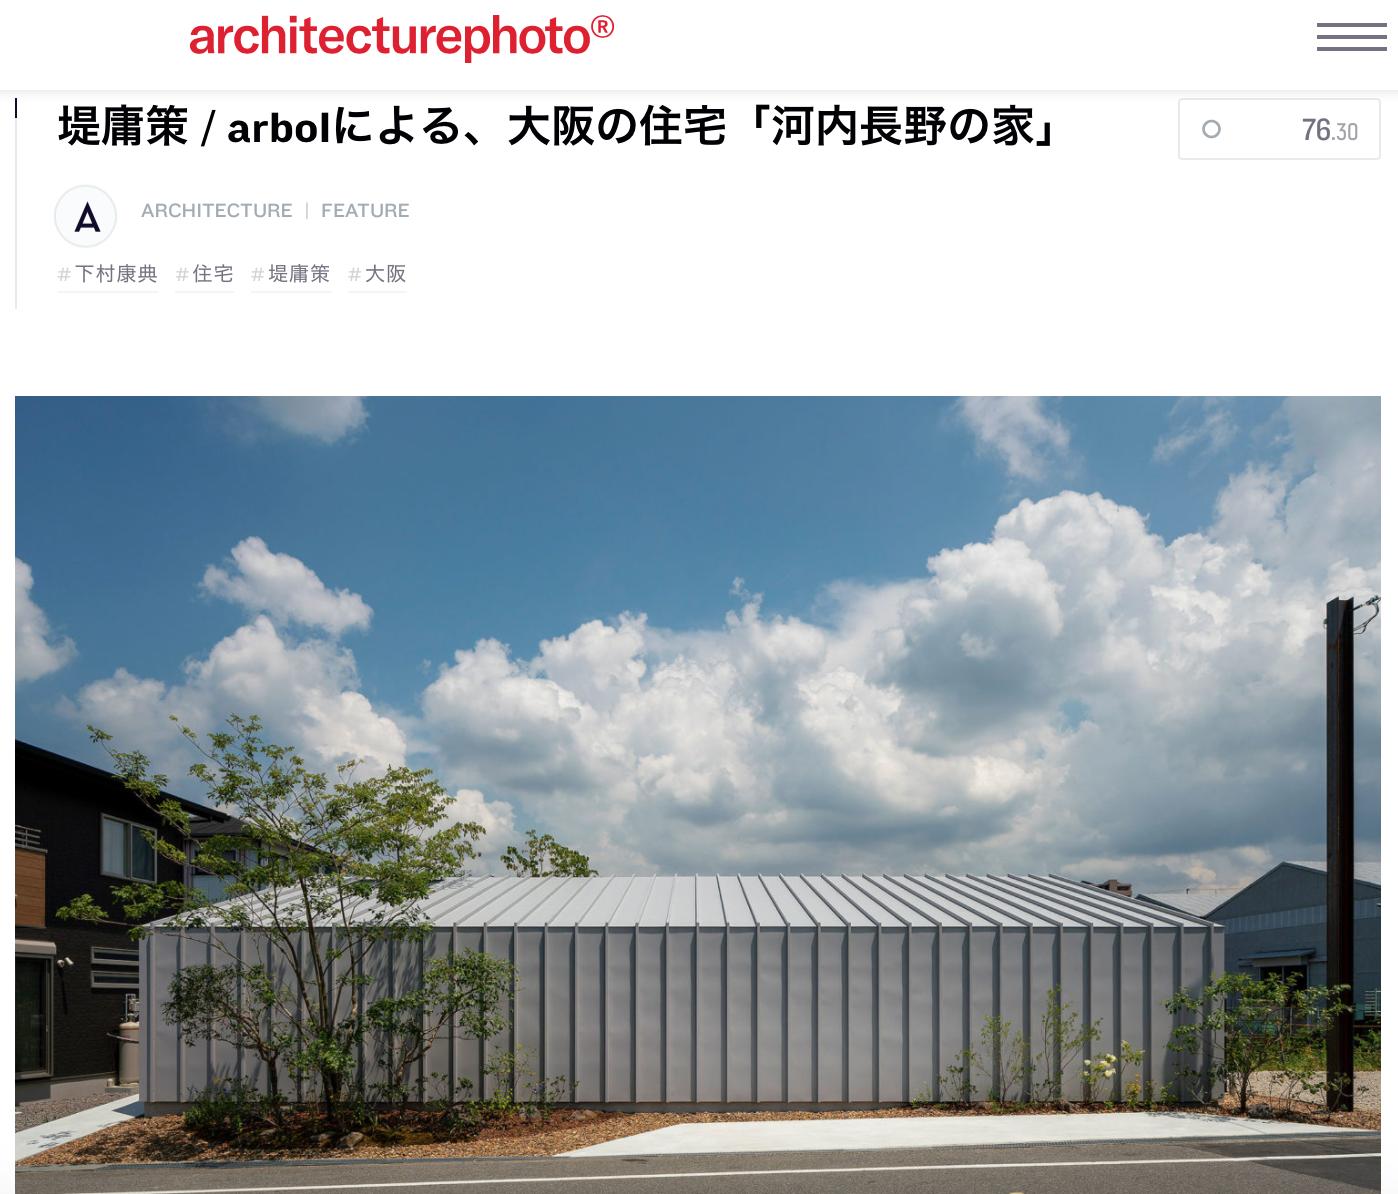 architectuephoto_河内長野.png